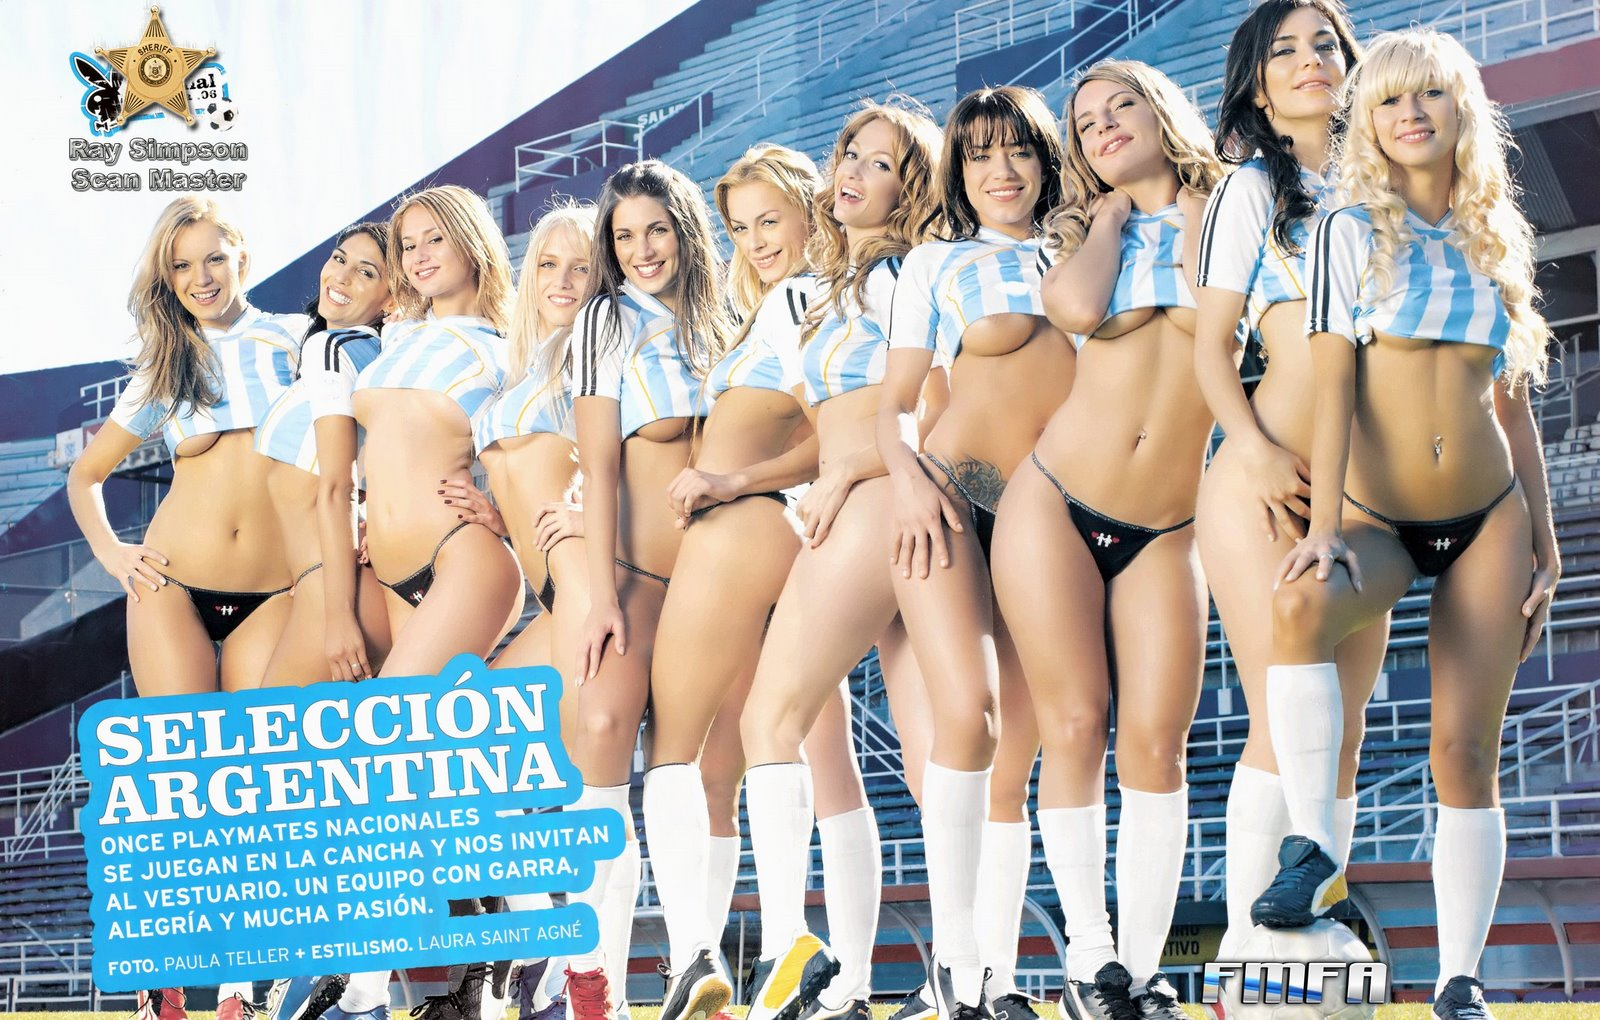 chica porno argentina: